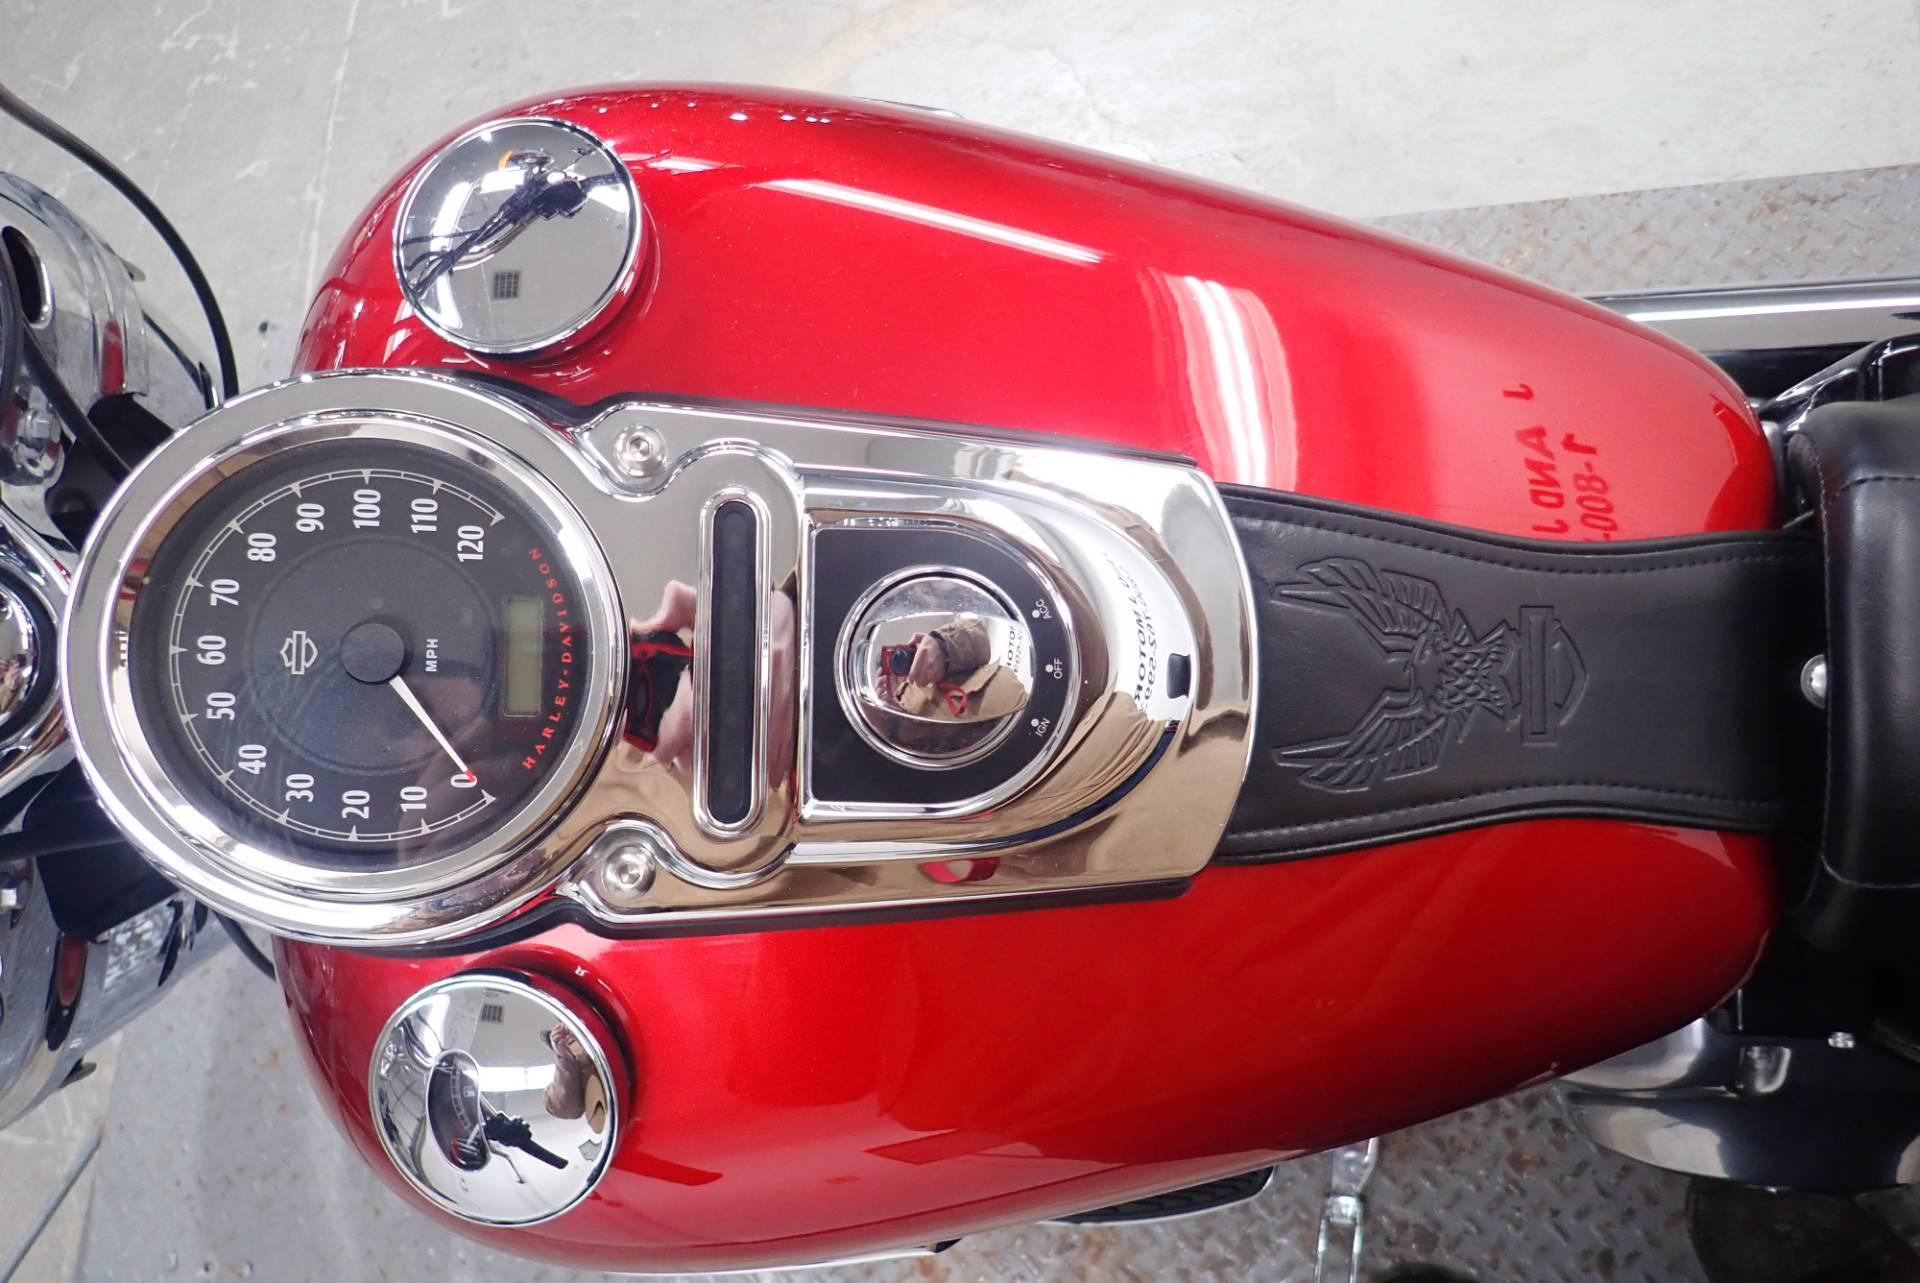 2012 Harley-Davidson Dyna Switchback 9